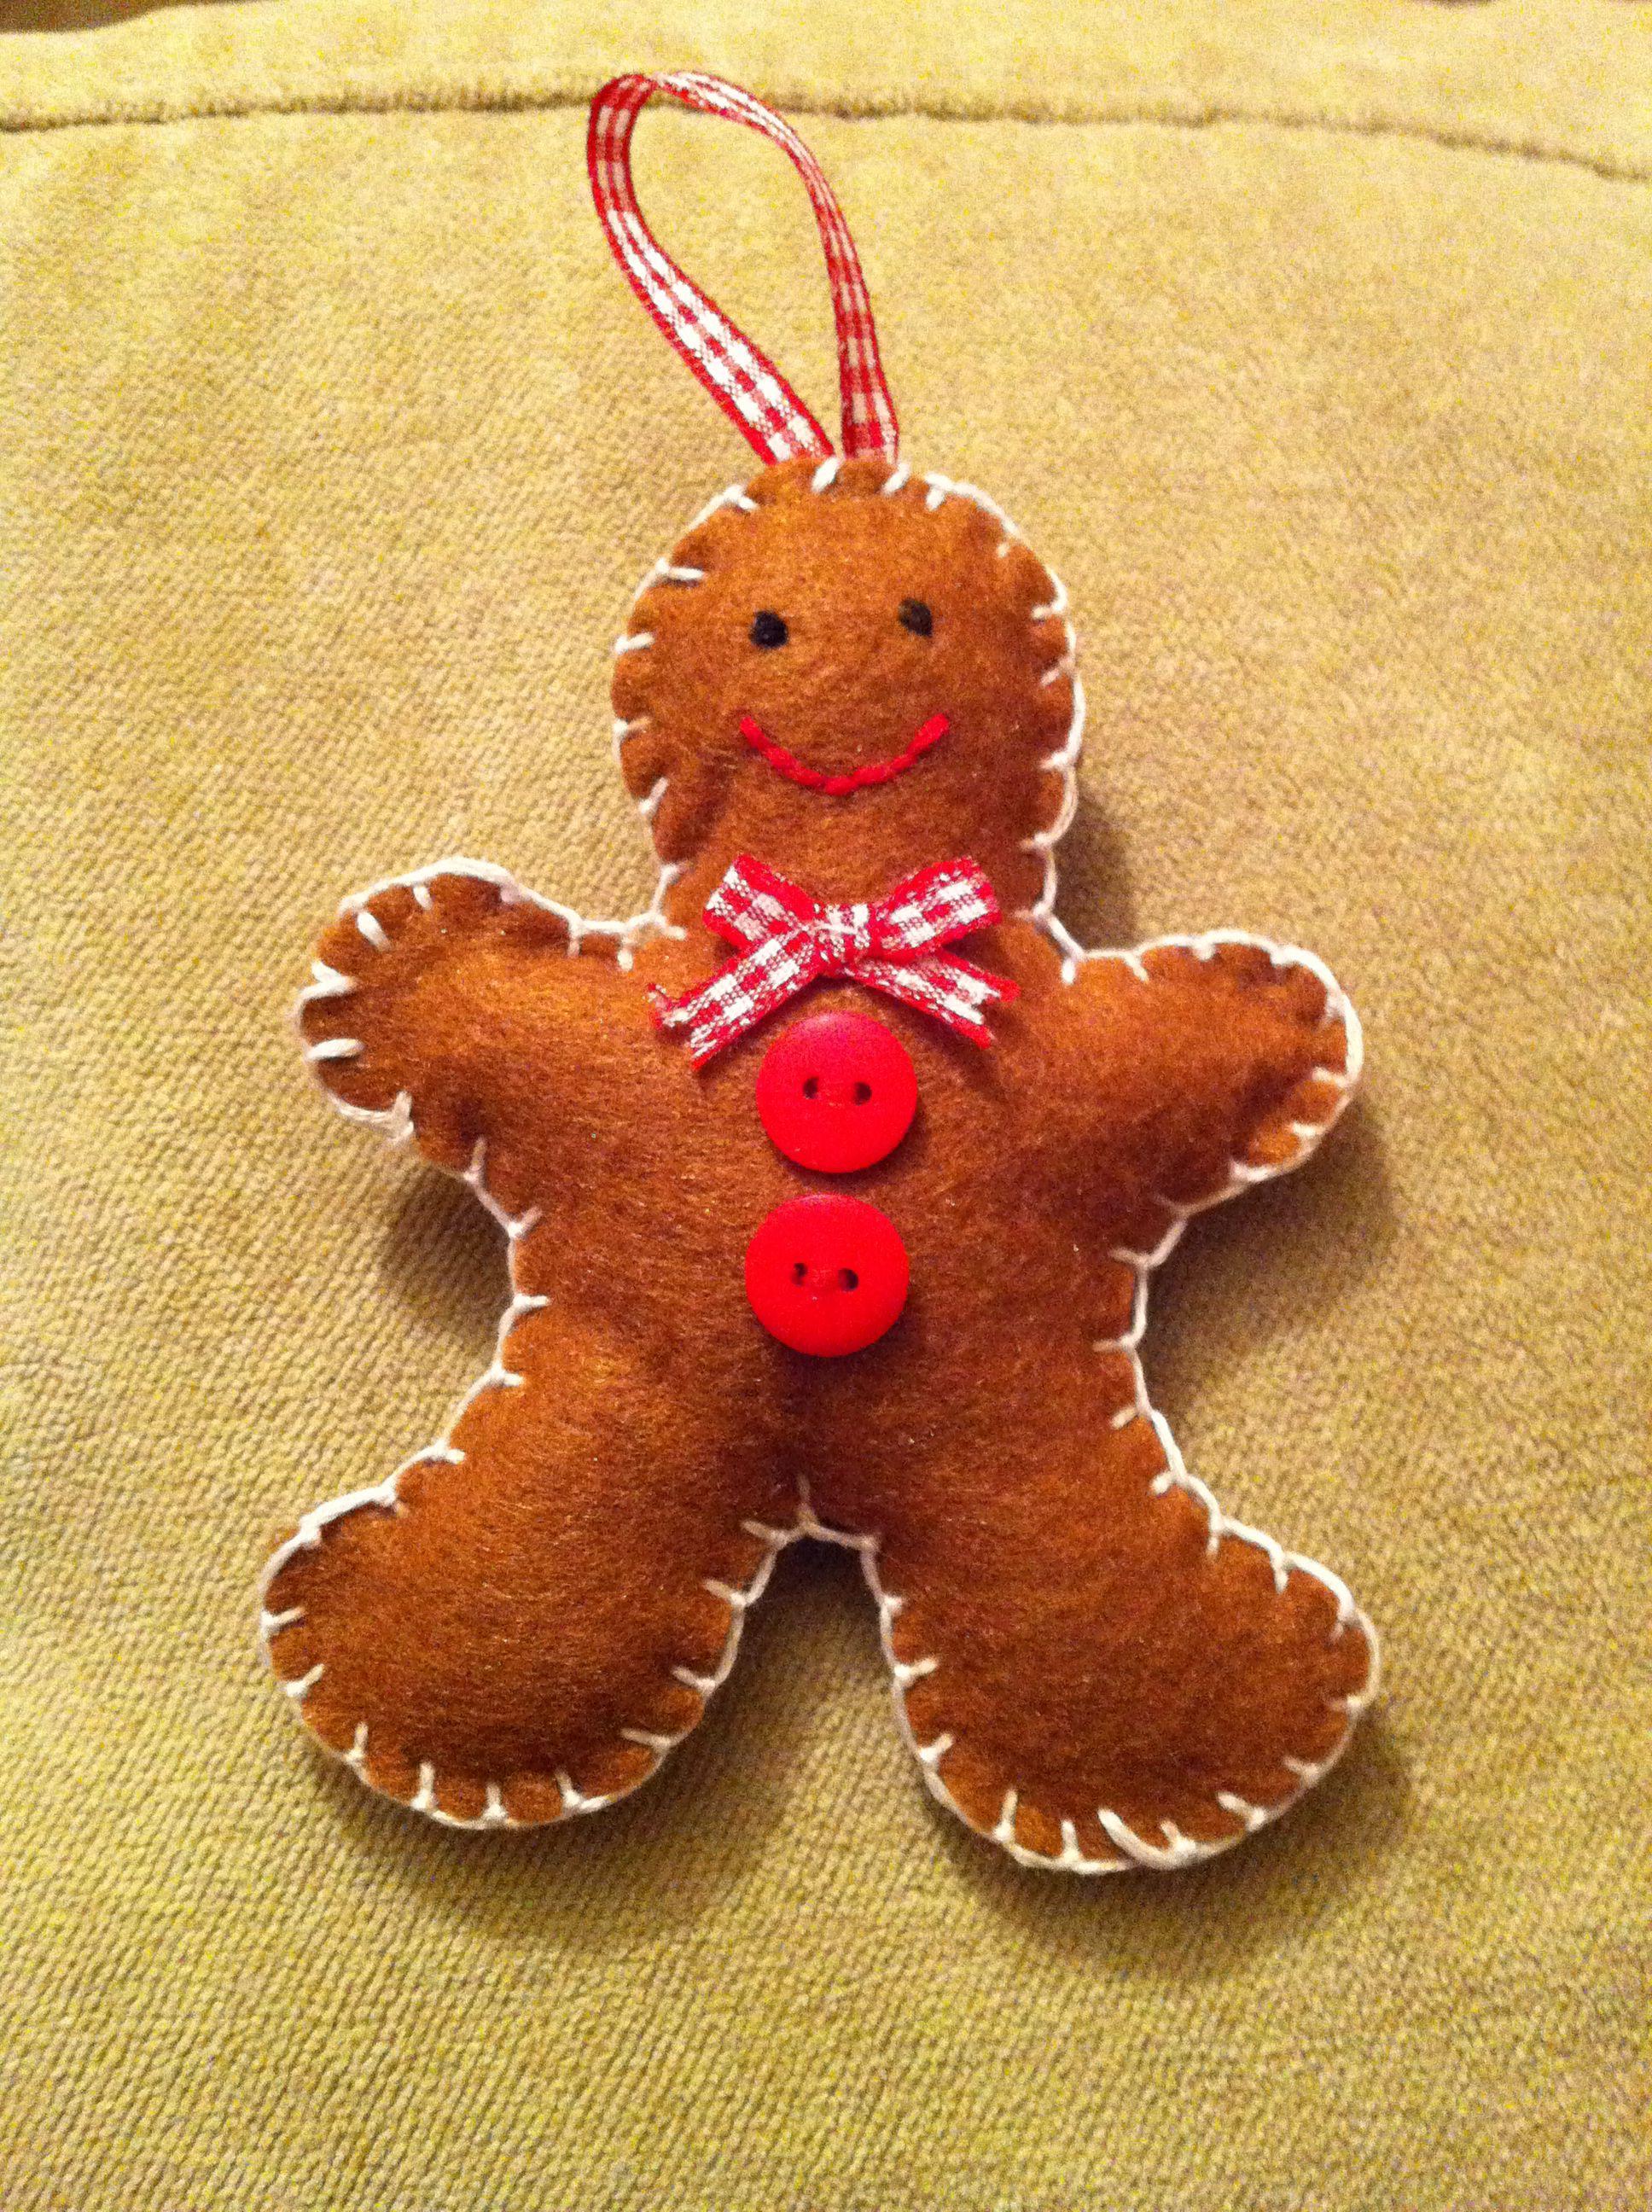 Mr Gingerbread Man